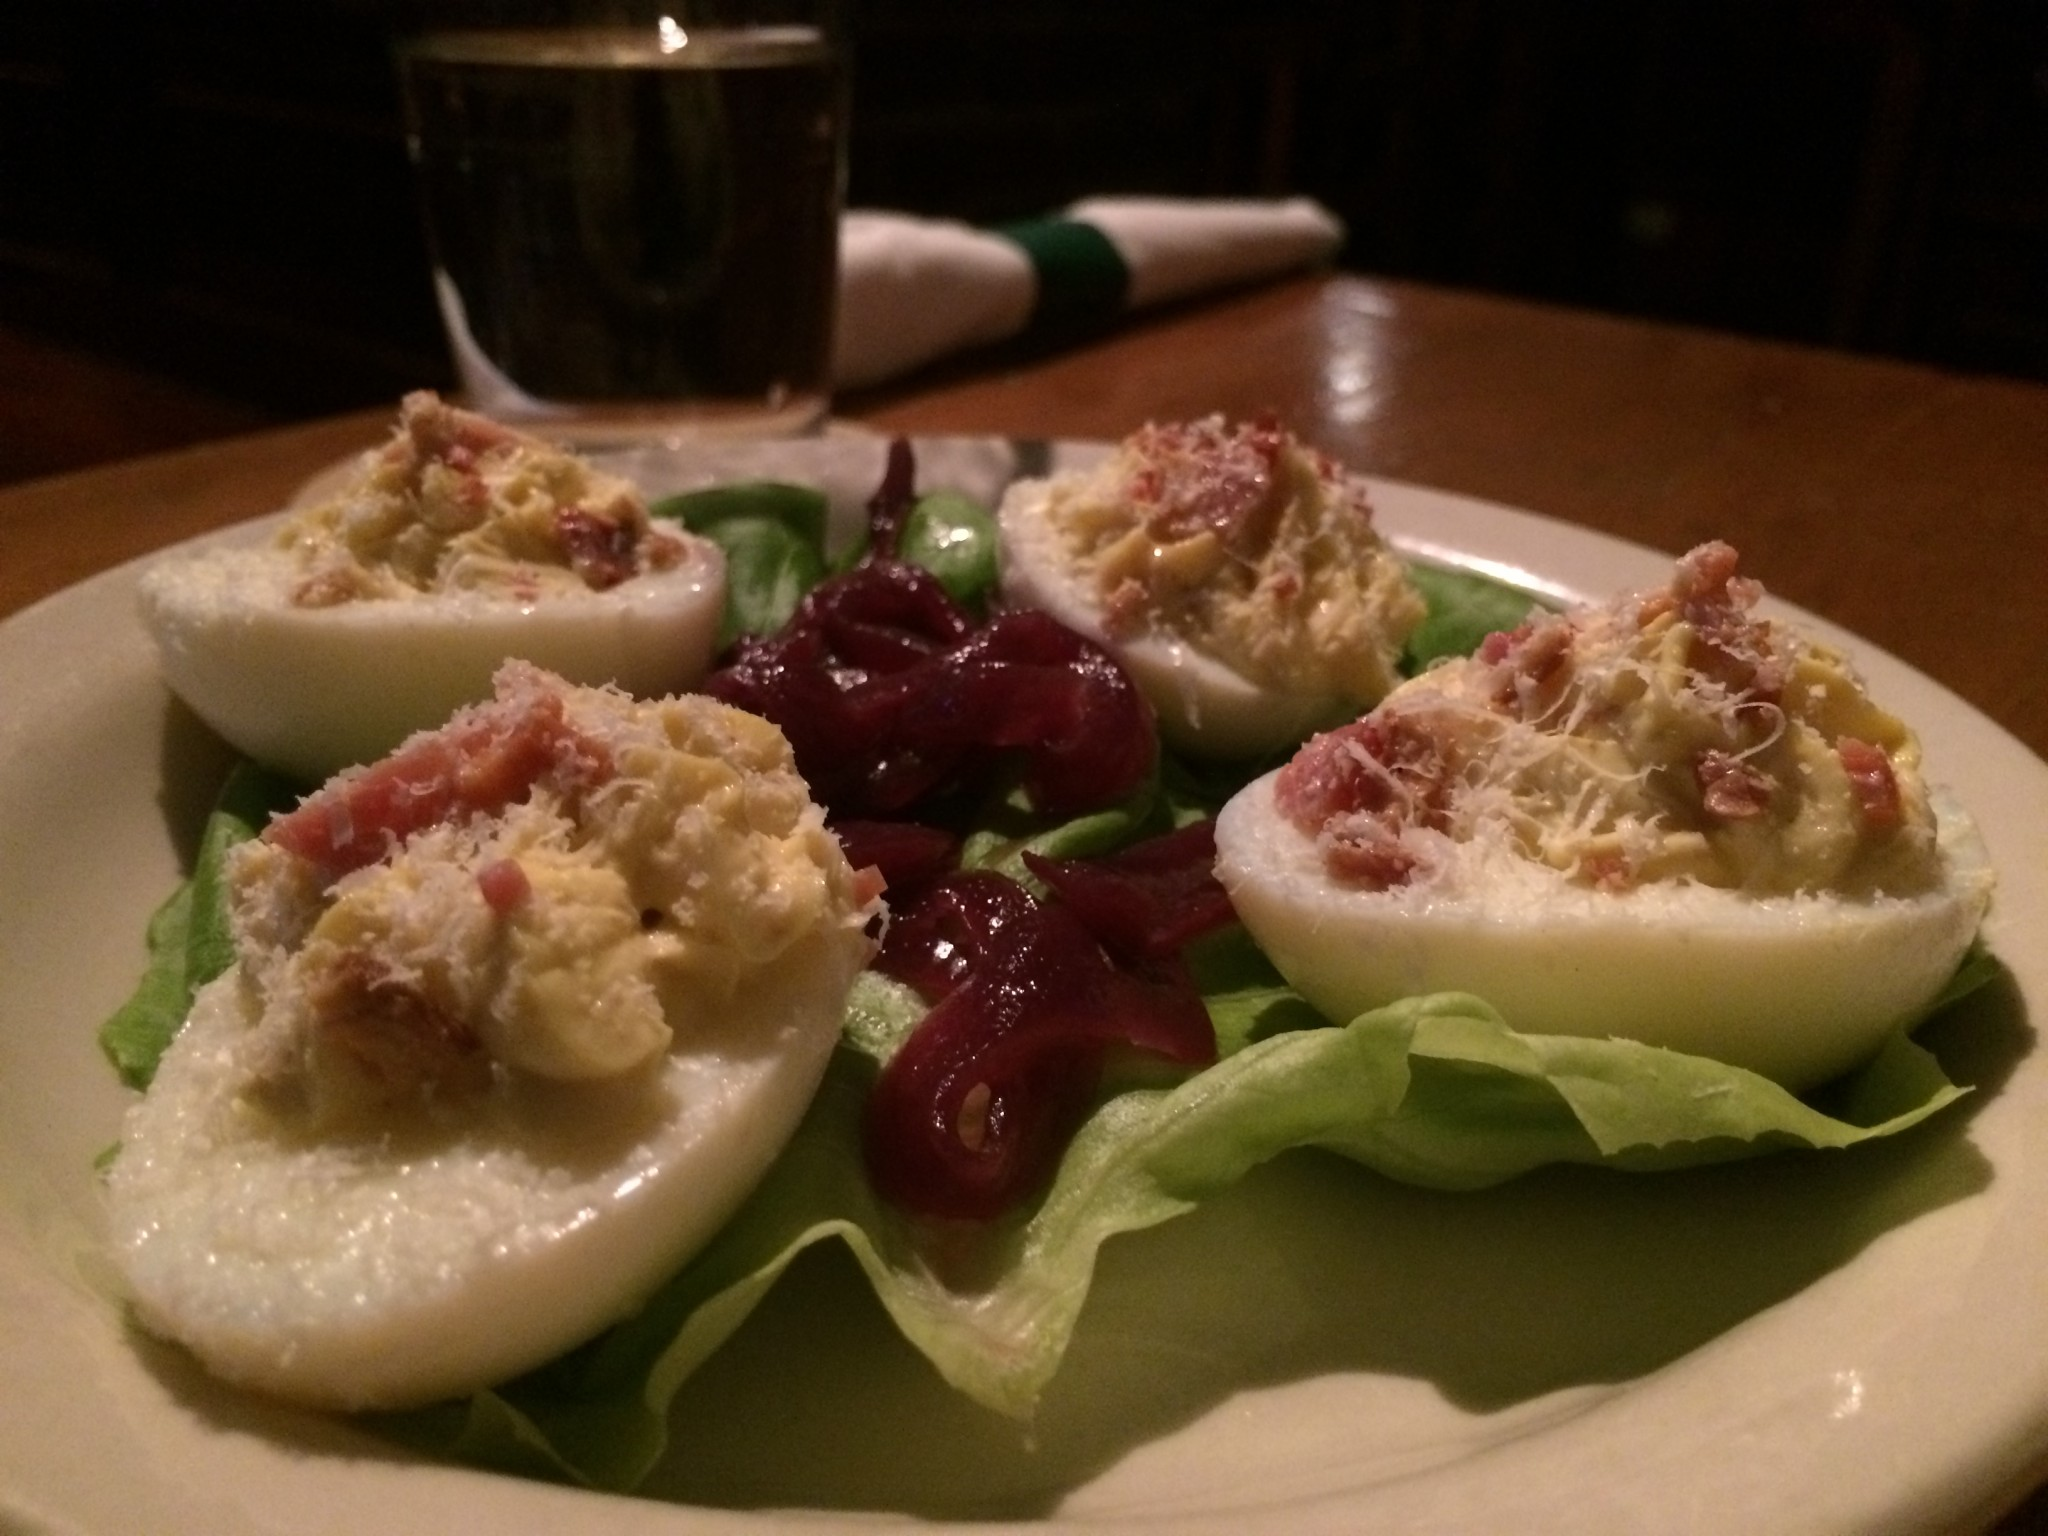 Barley Republic - Parmesan Deviled Eggs